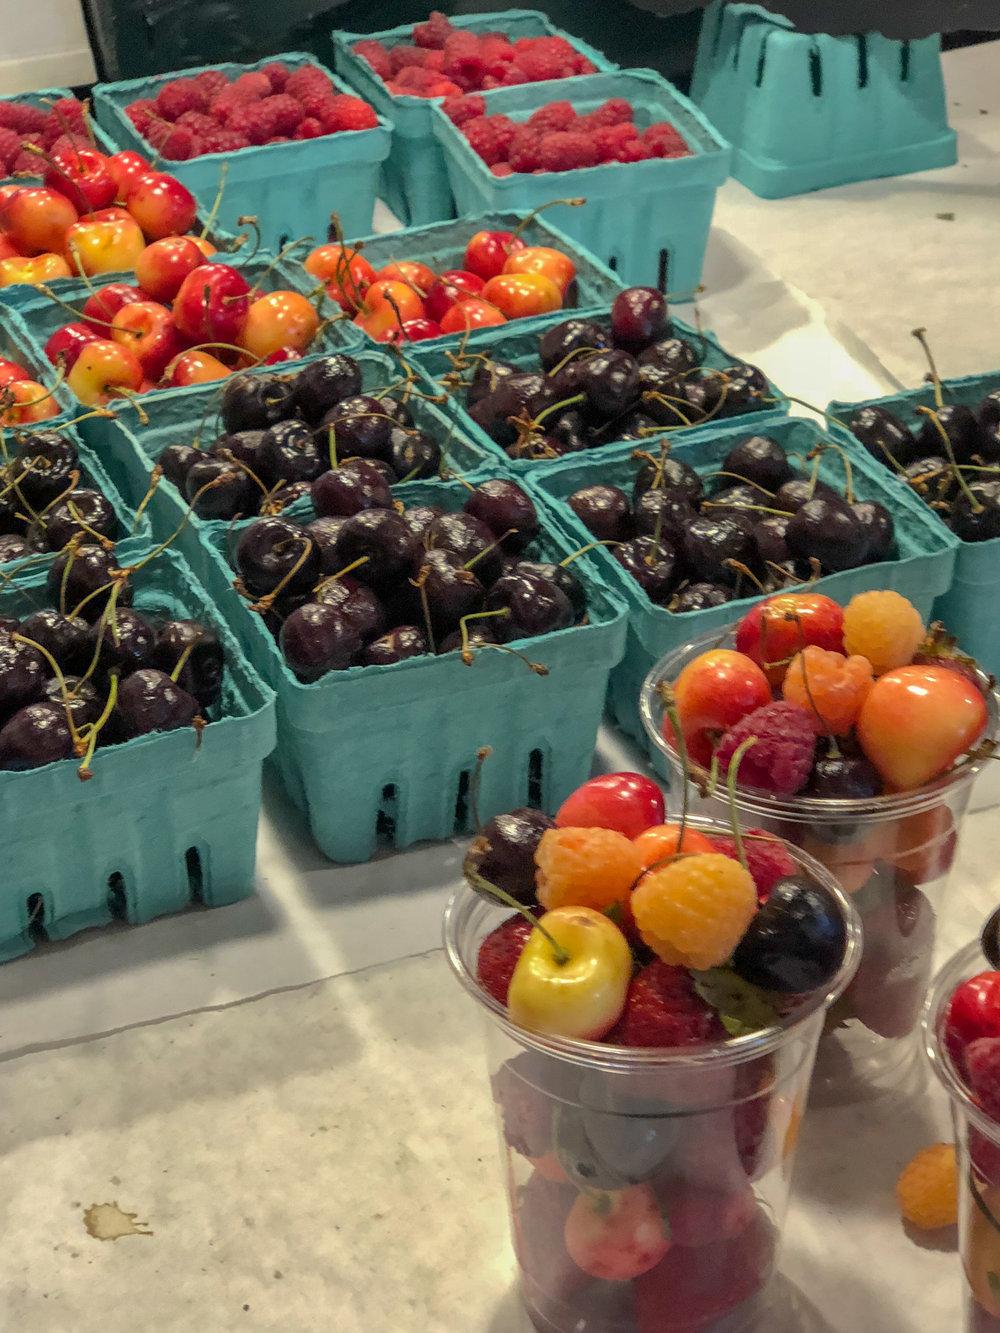 fruit at market.jpg